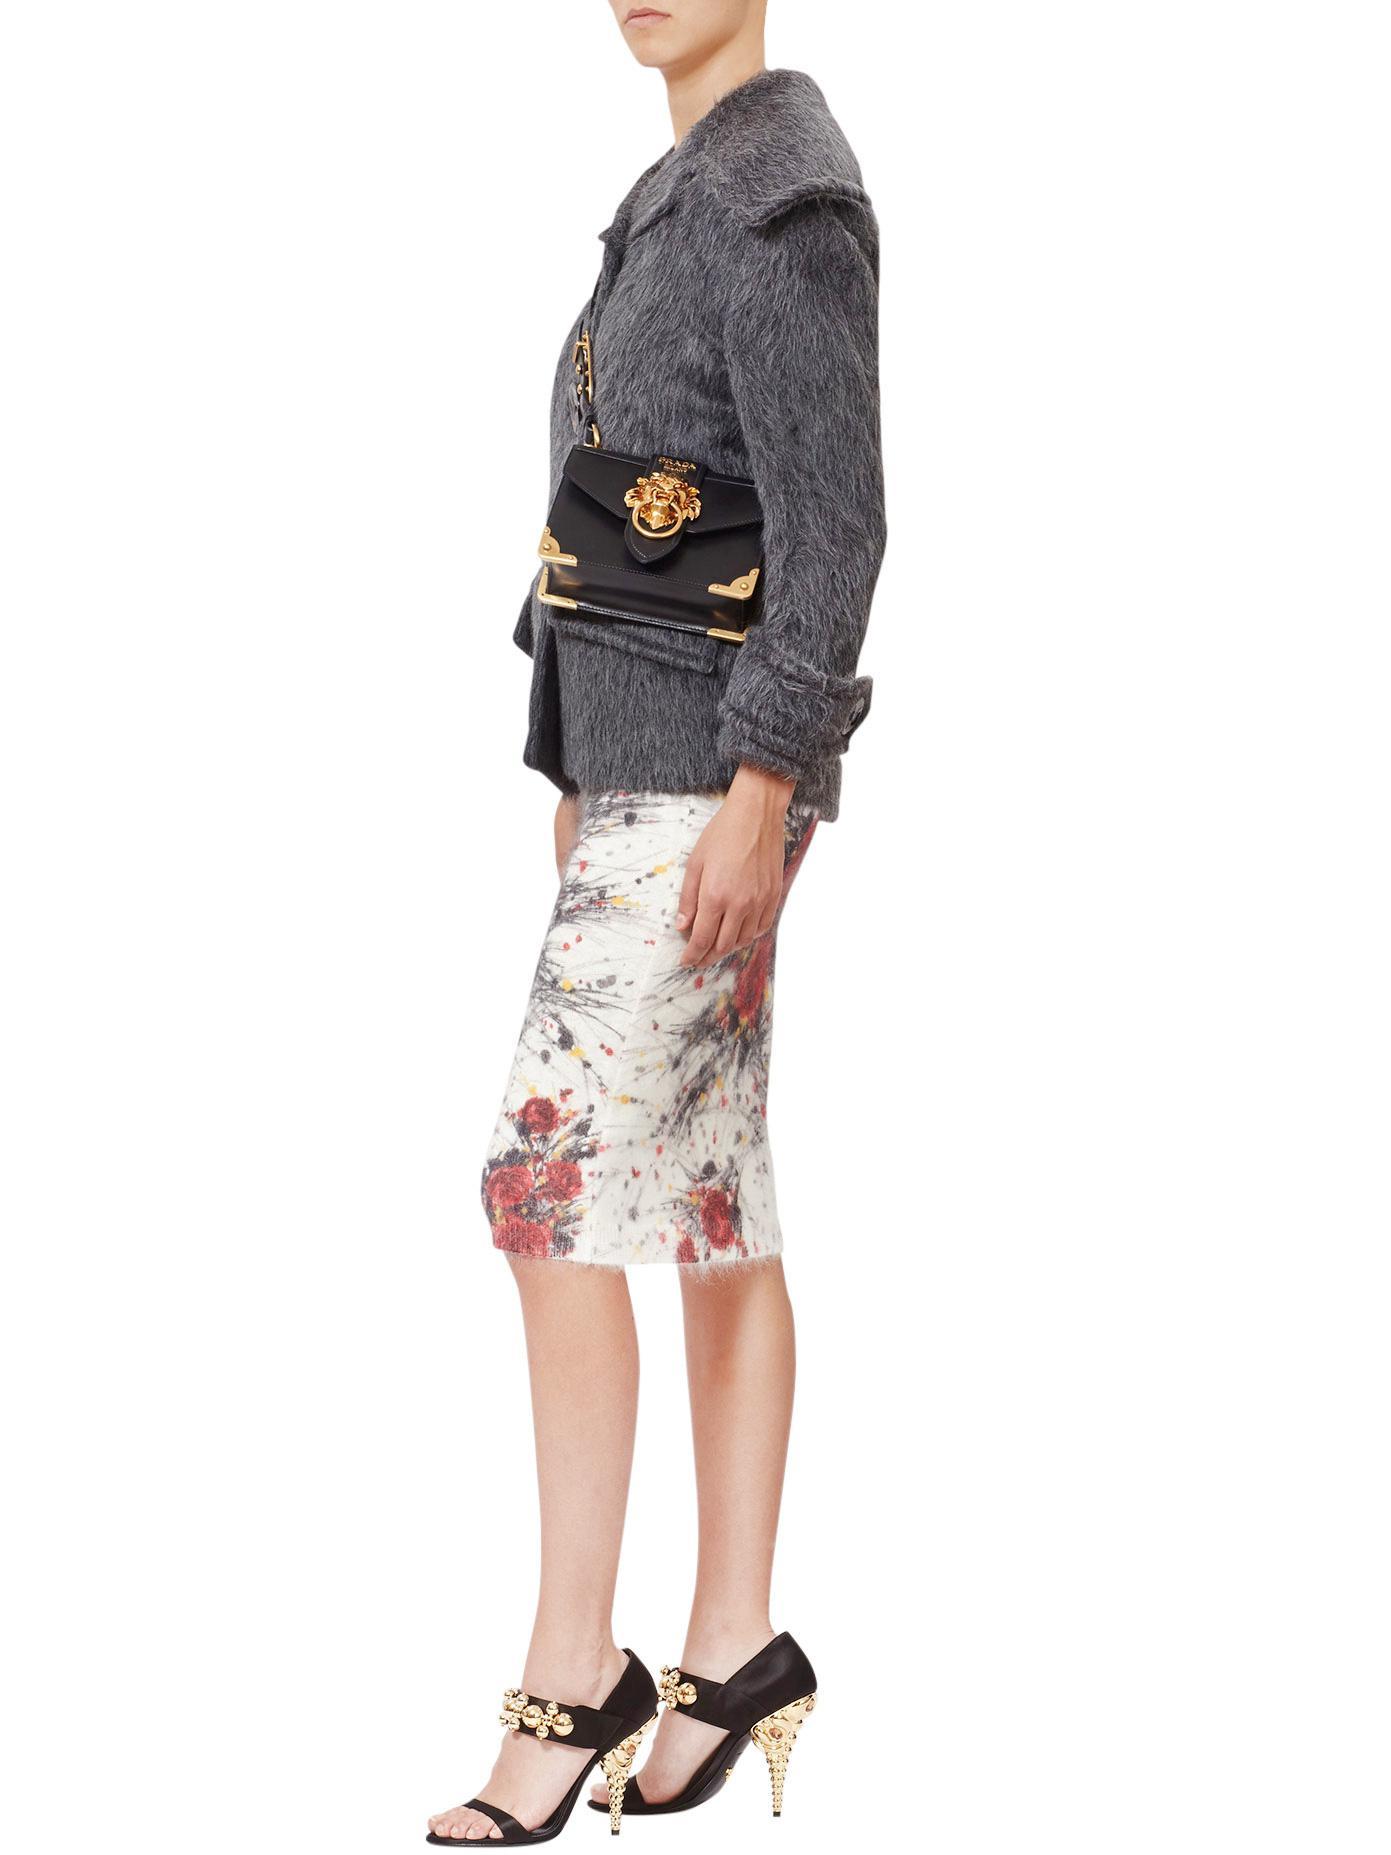 Prada Cahier Lion Head Leather Bag in Black